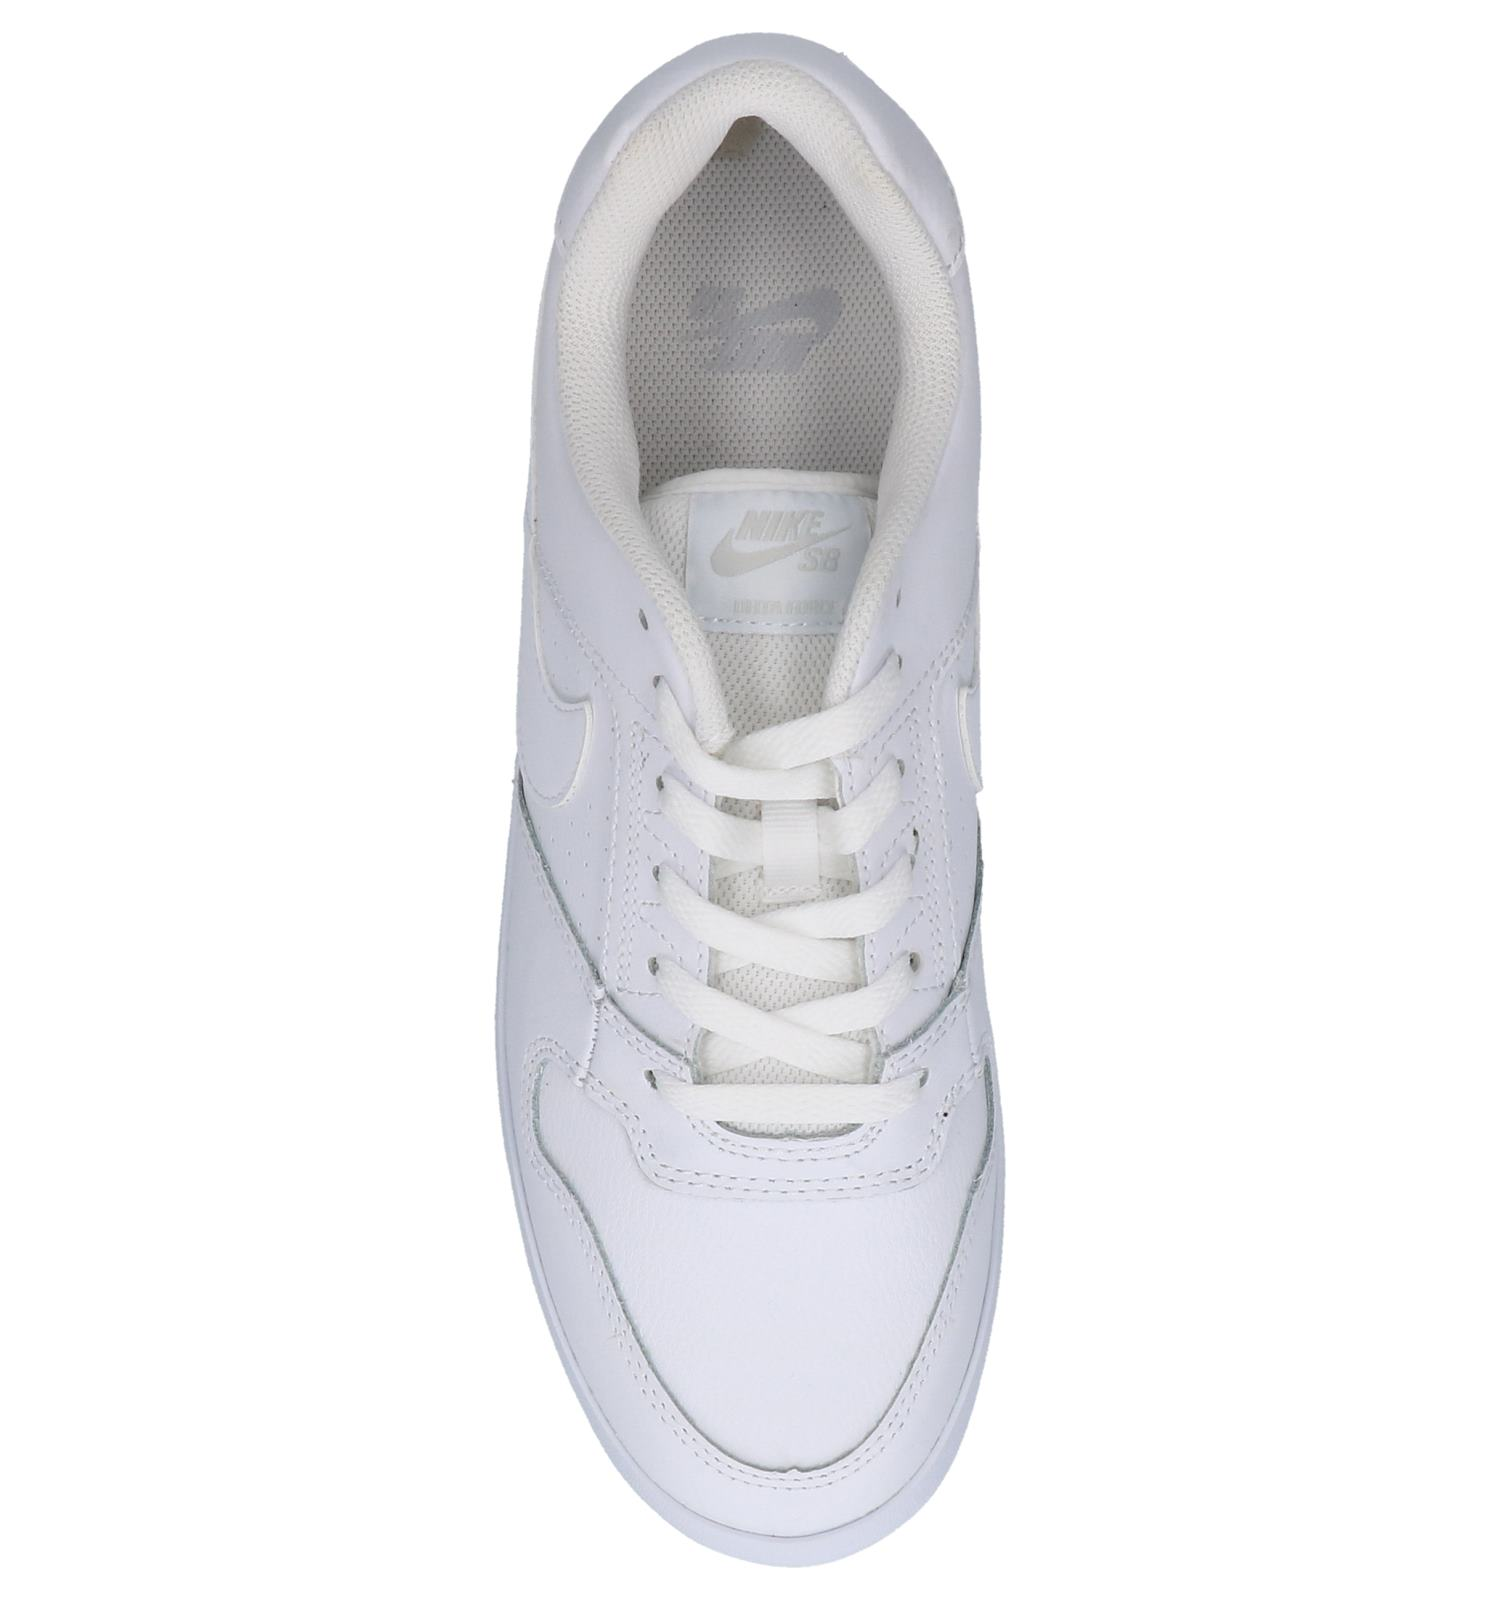 online store 06725 84522 Nike SB Delta Force Vulc Witte Sneakers | TORFS.BE | Gratis verzend en  retour